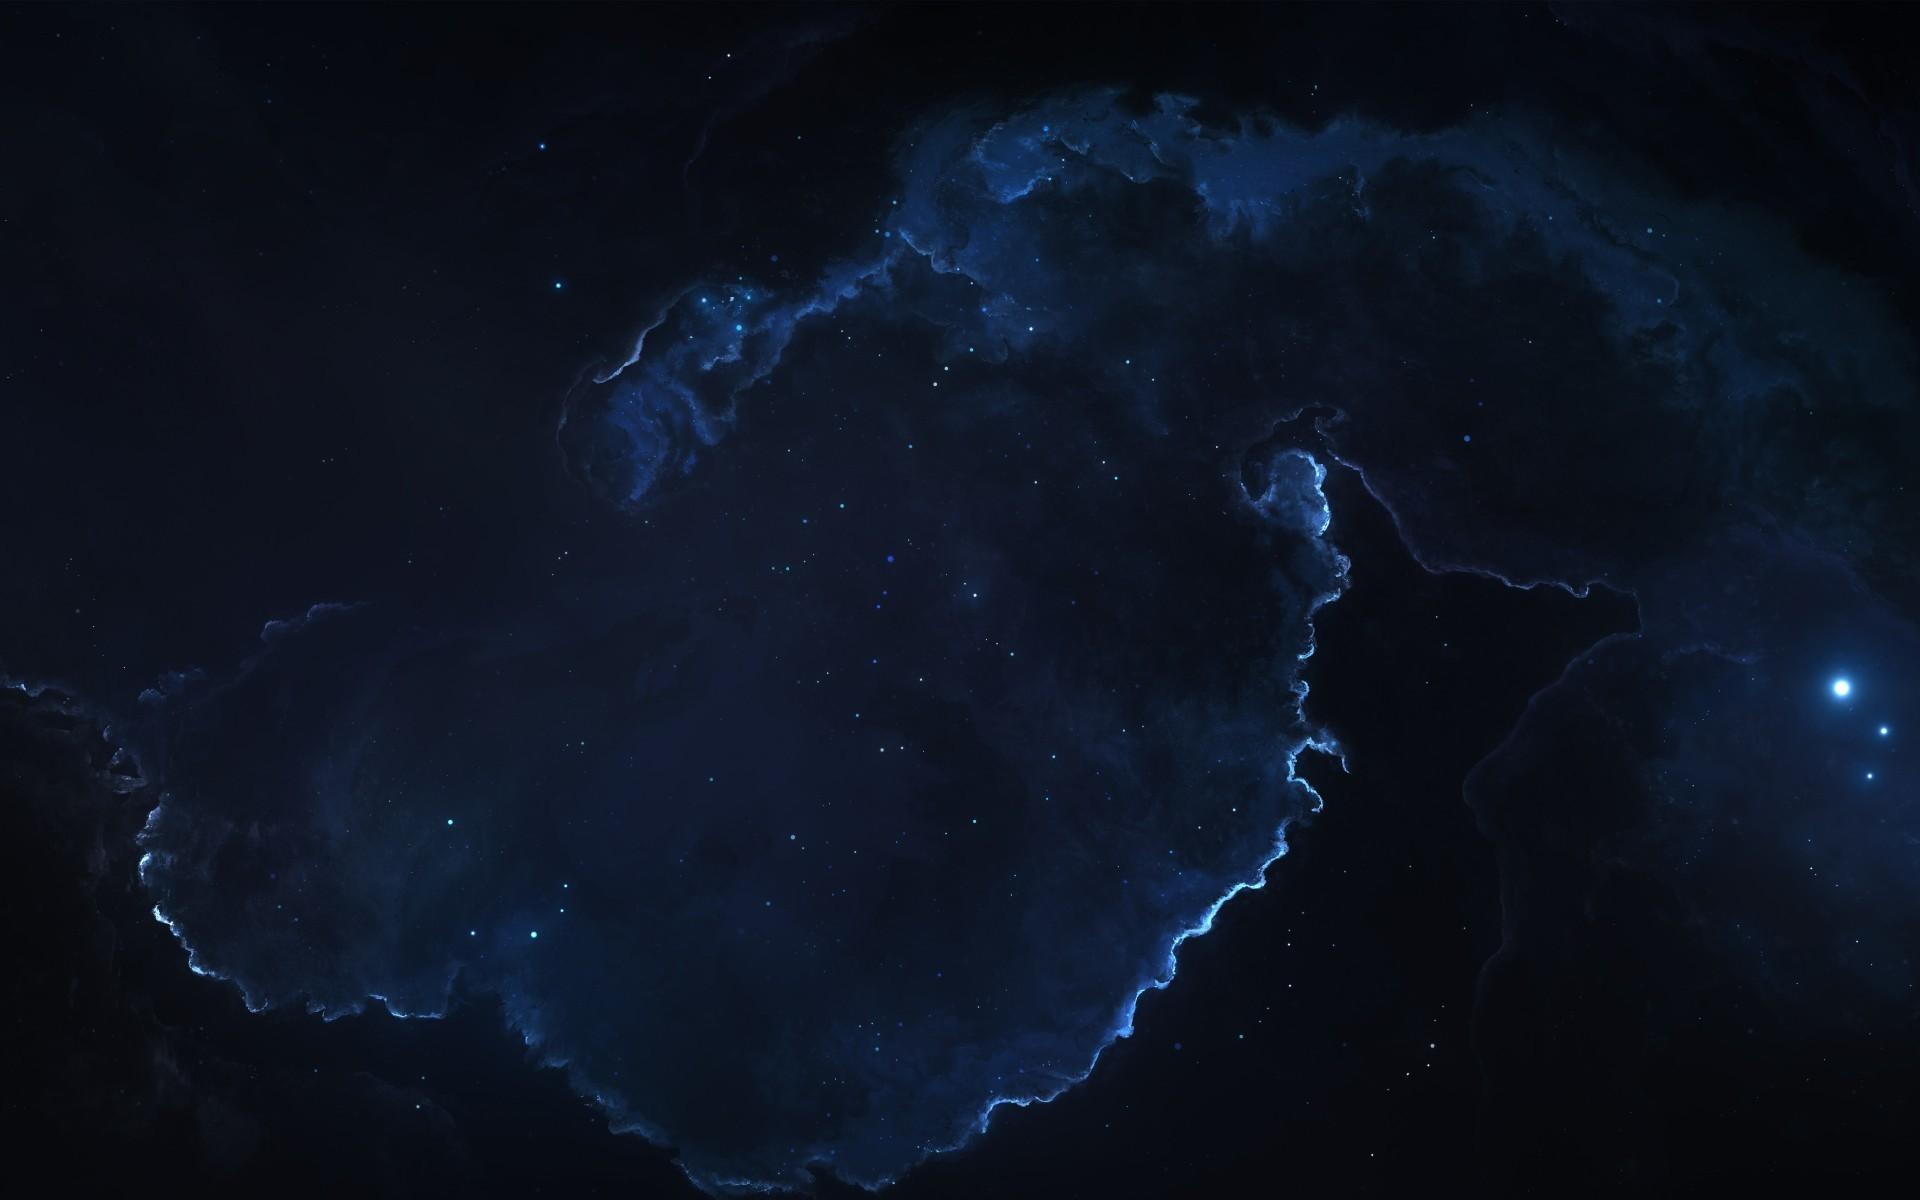 Space / Dark space Wallpaper